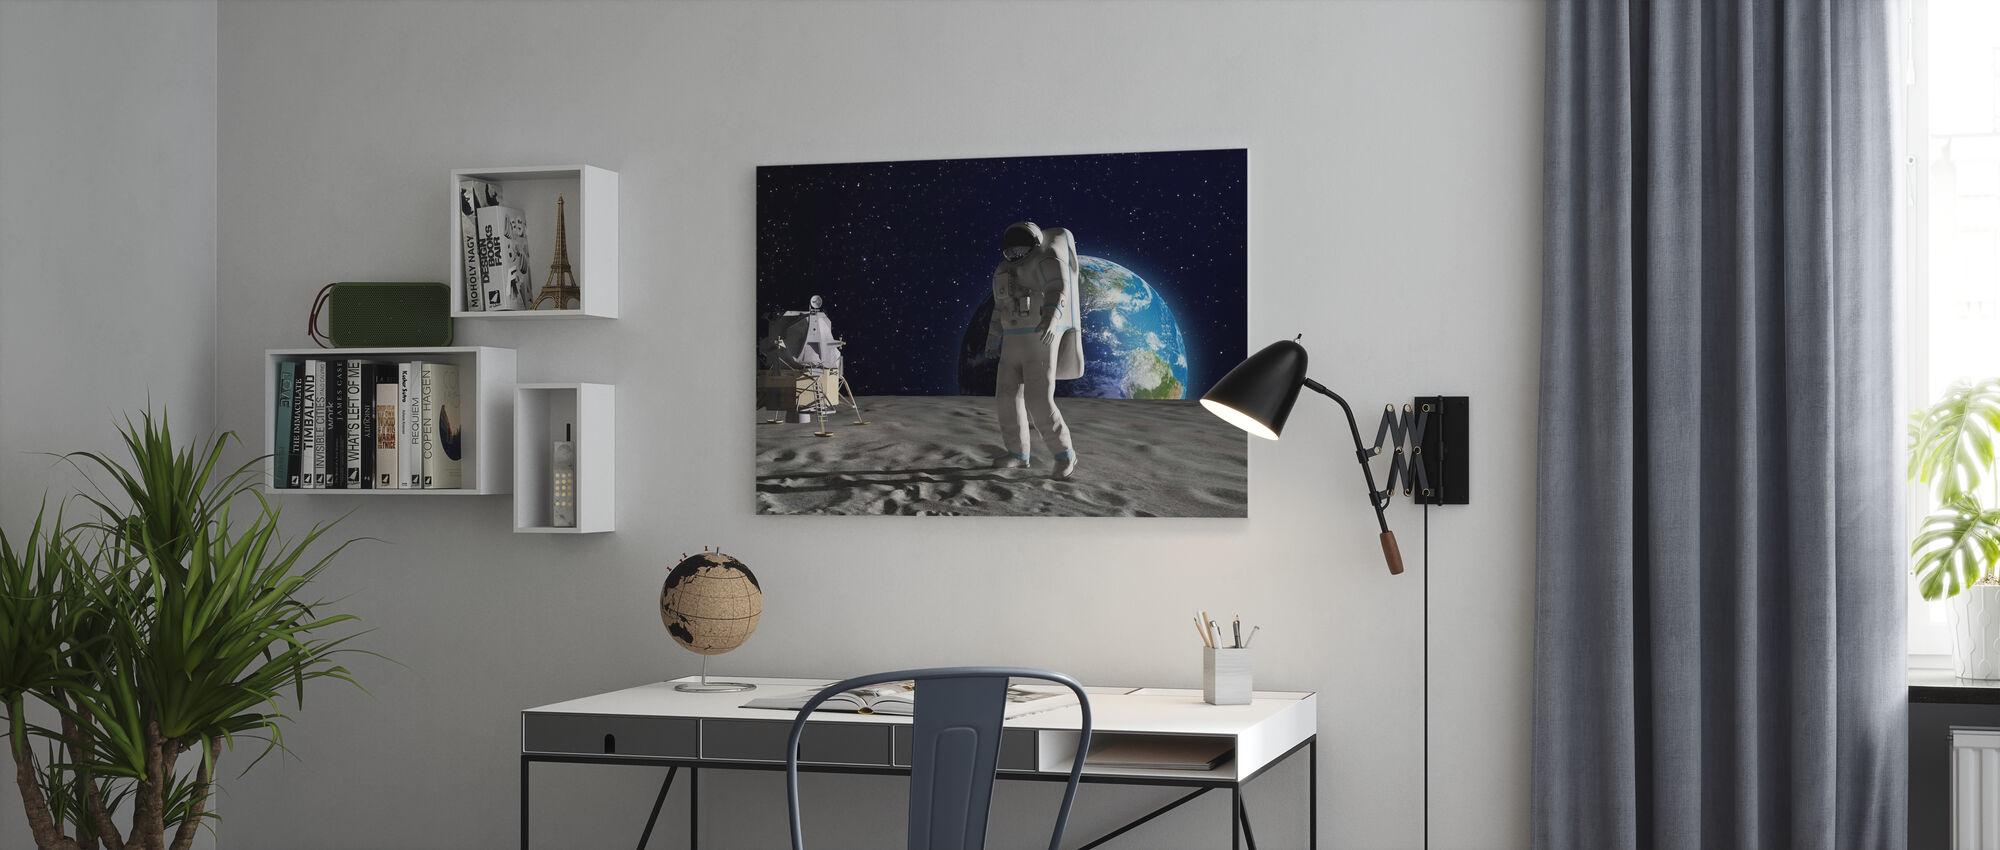 Astronaut on the Moon - Canvas print - Office